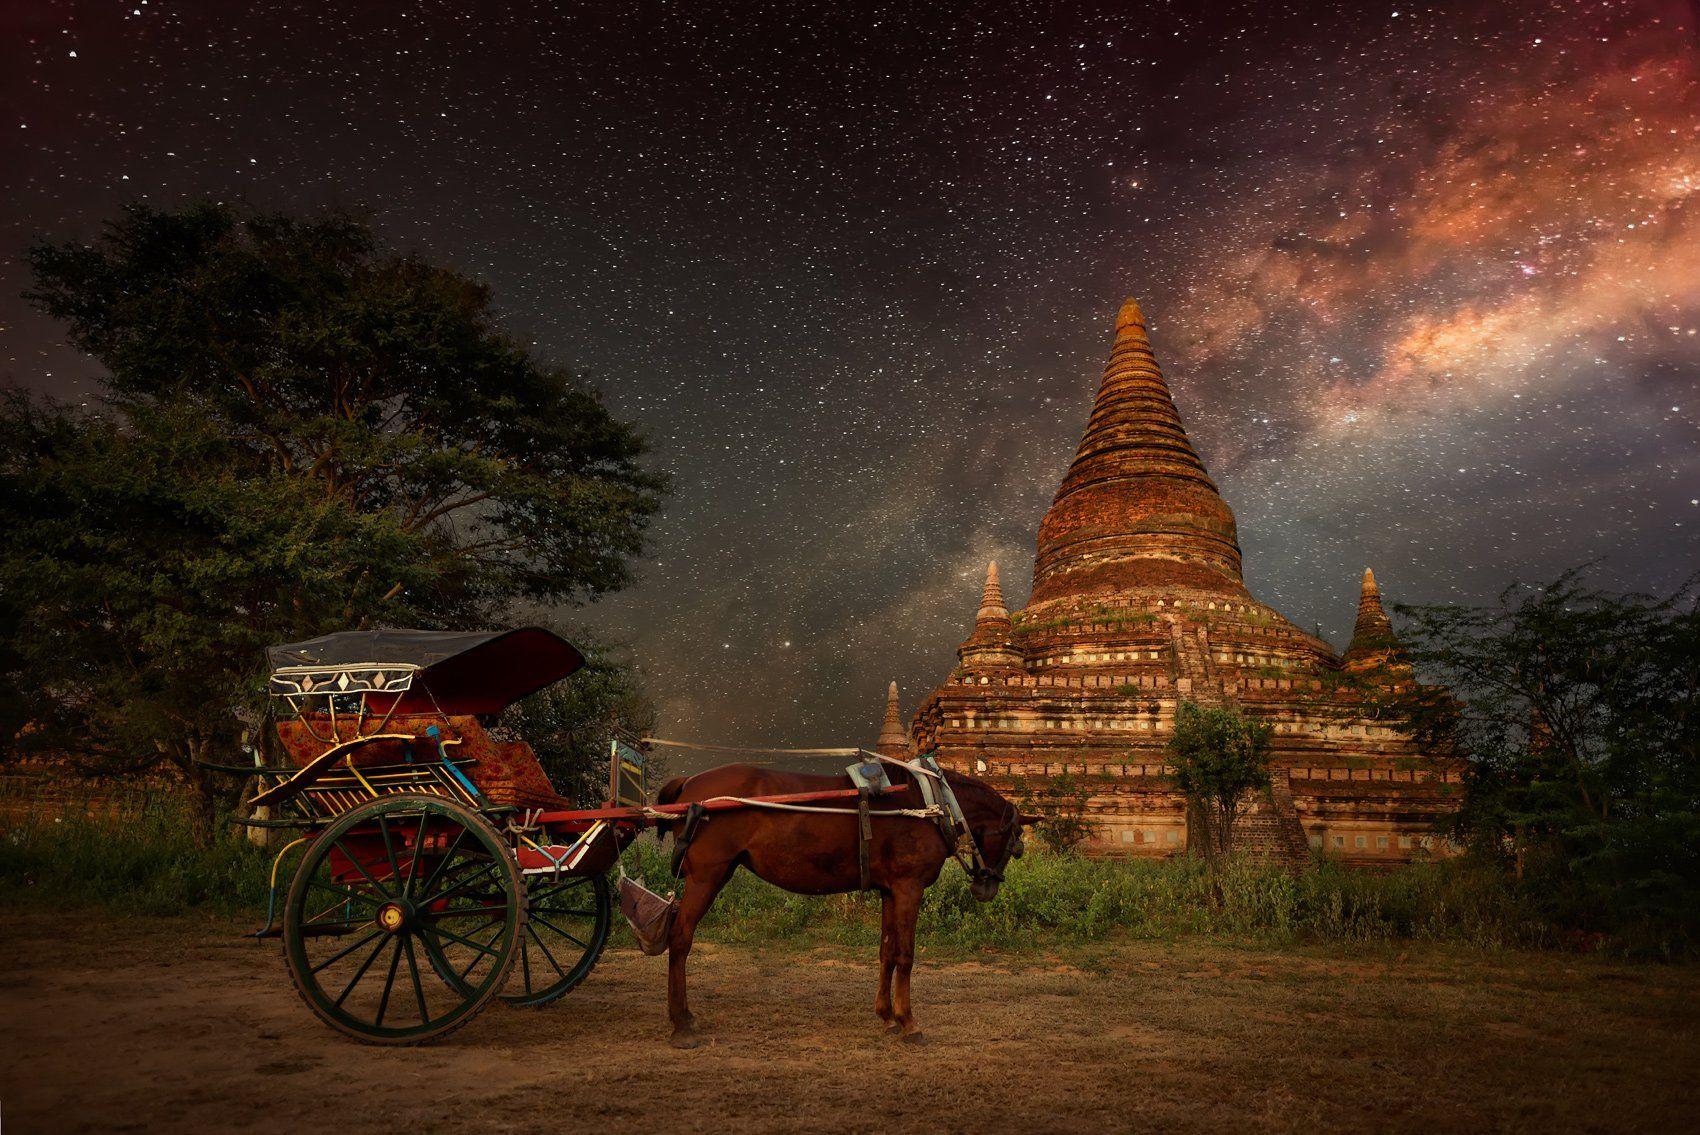 Bagan, Chorse, Milky way, Myanmar, Mystery, Pagoda, Soft Light